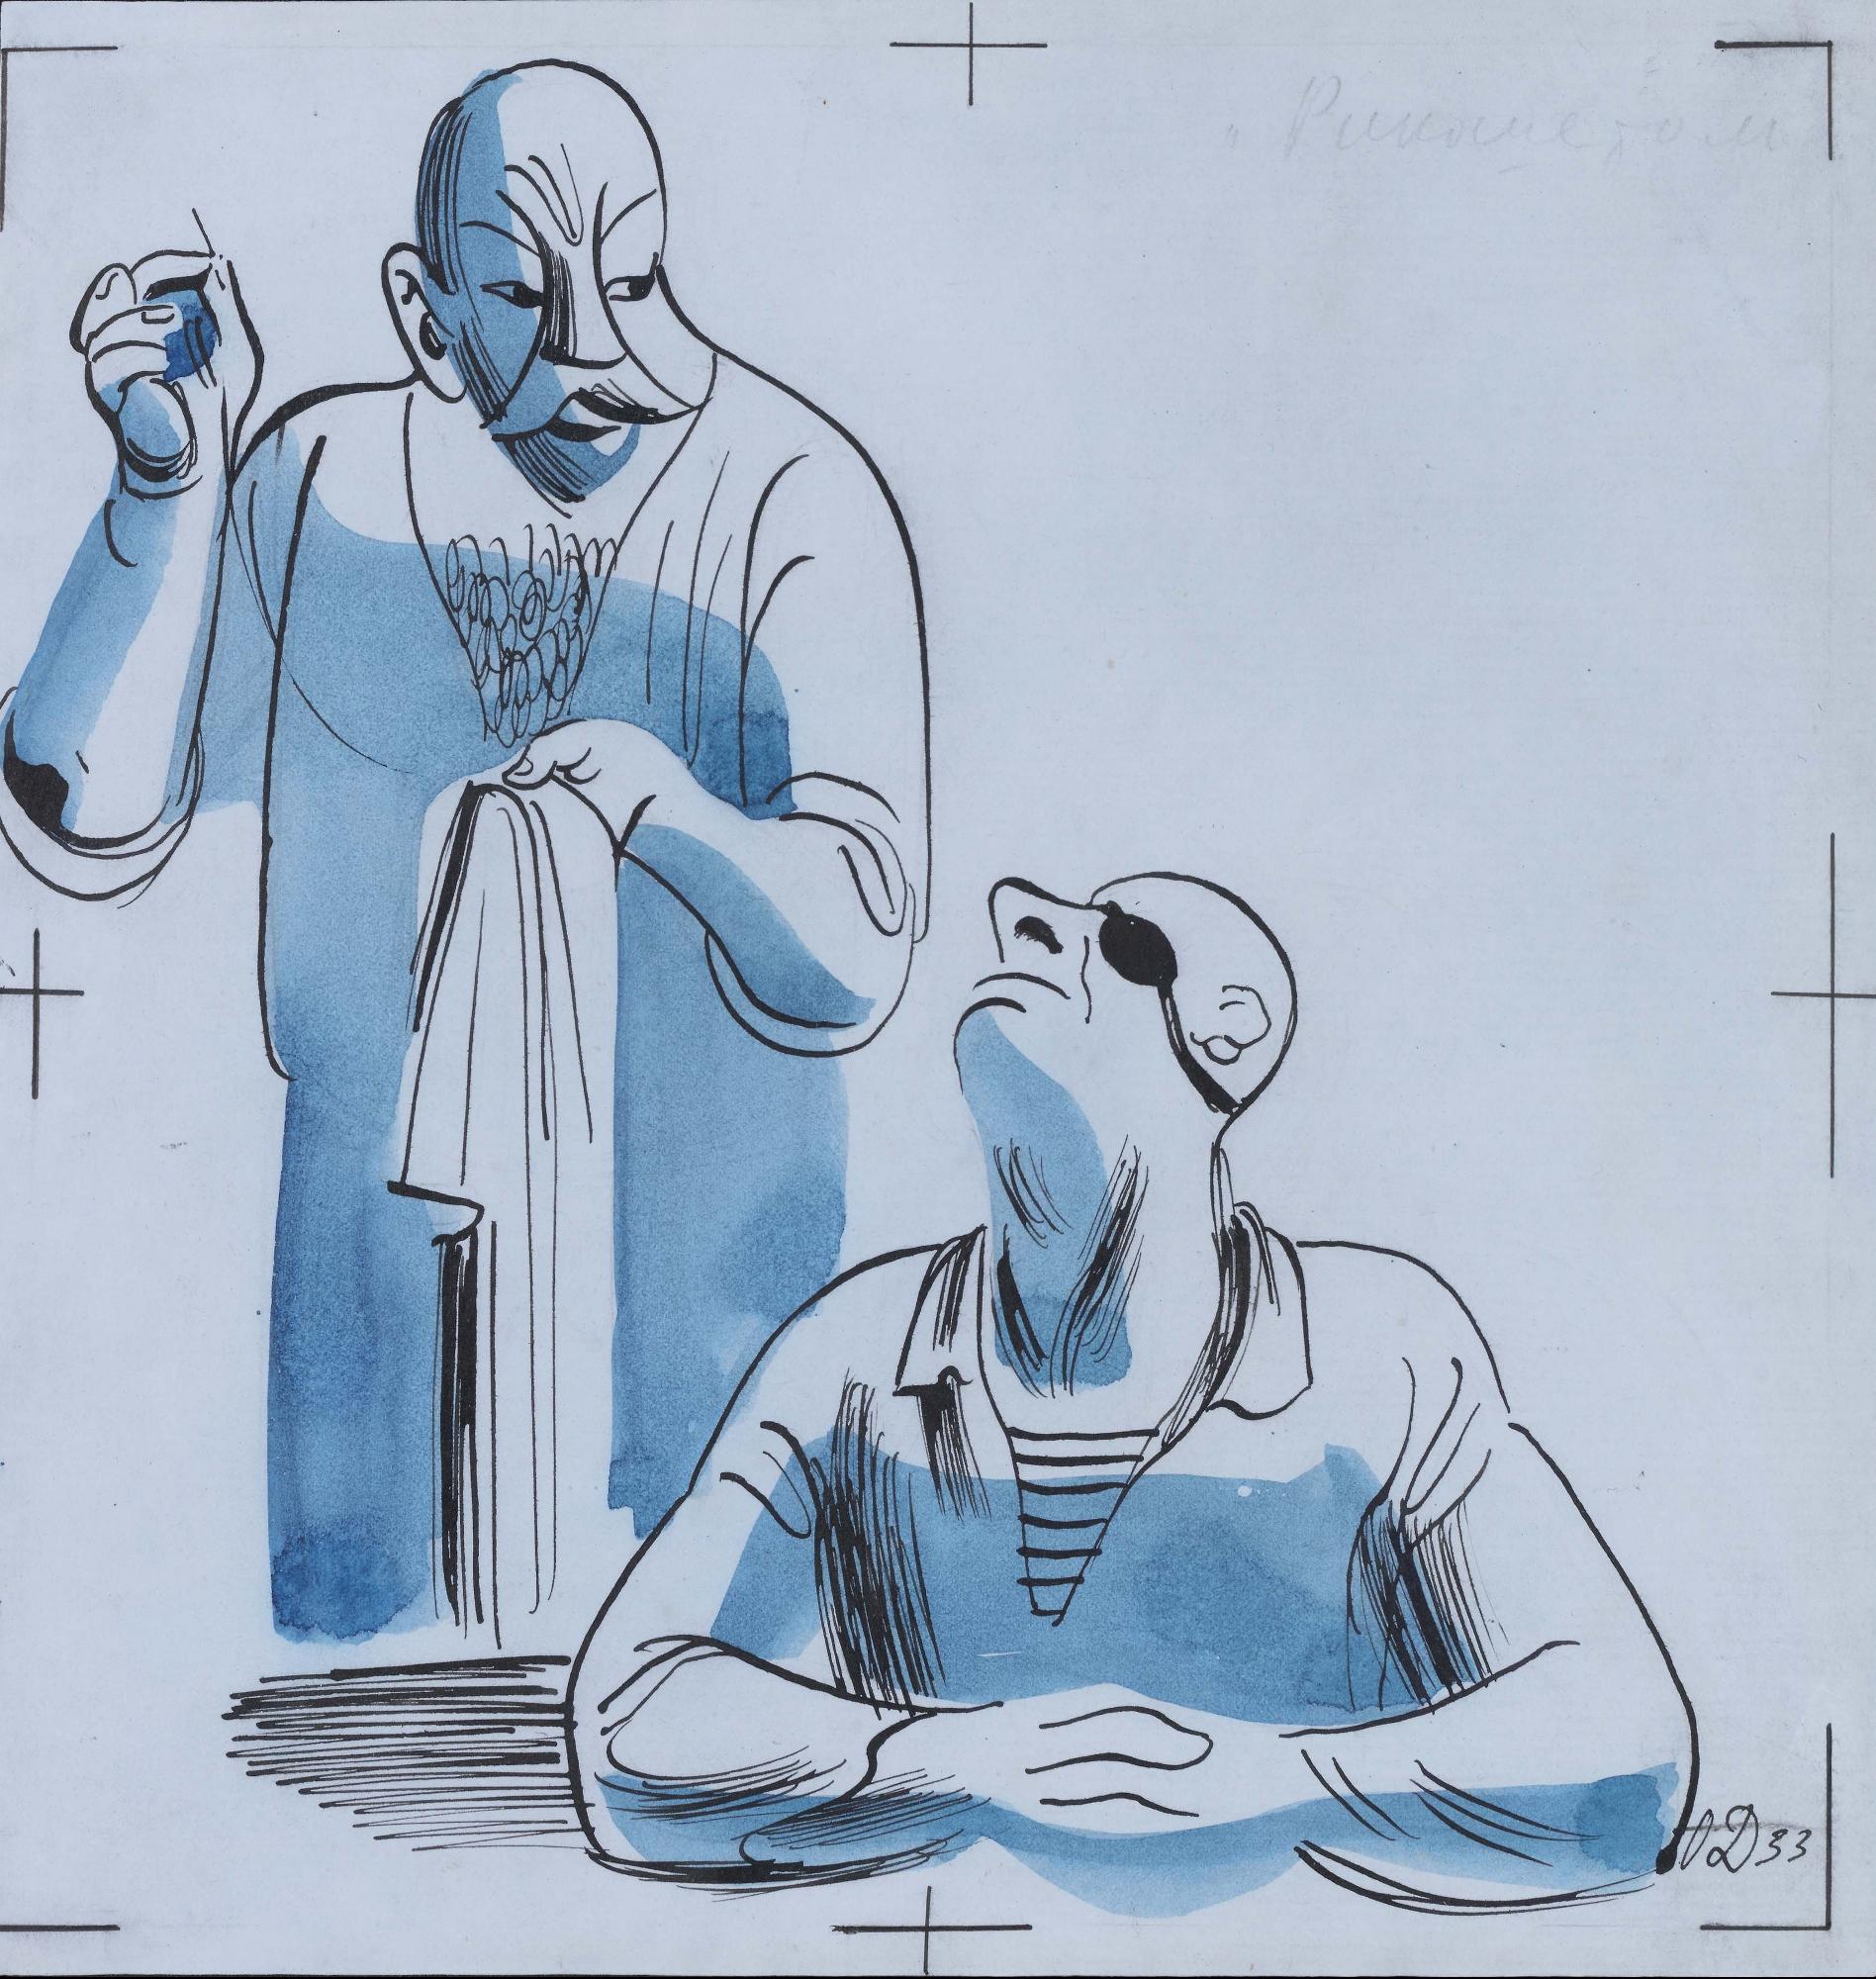 Book Illustration, 1933 - Alexander Dovgal